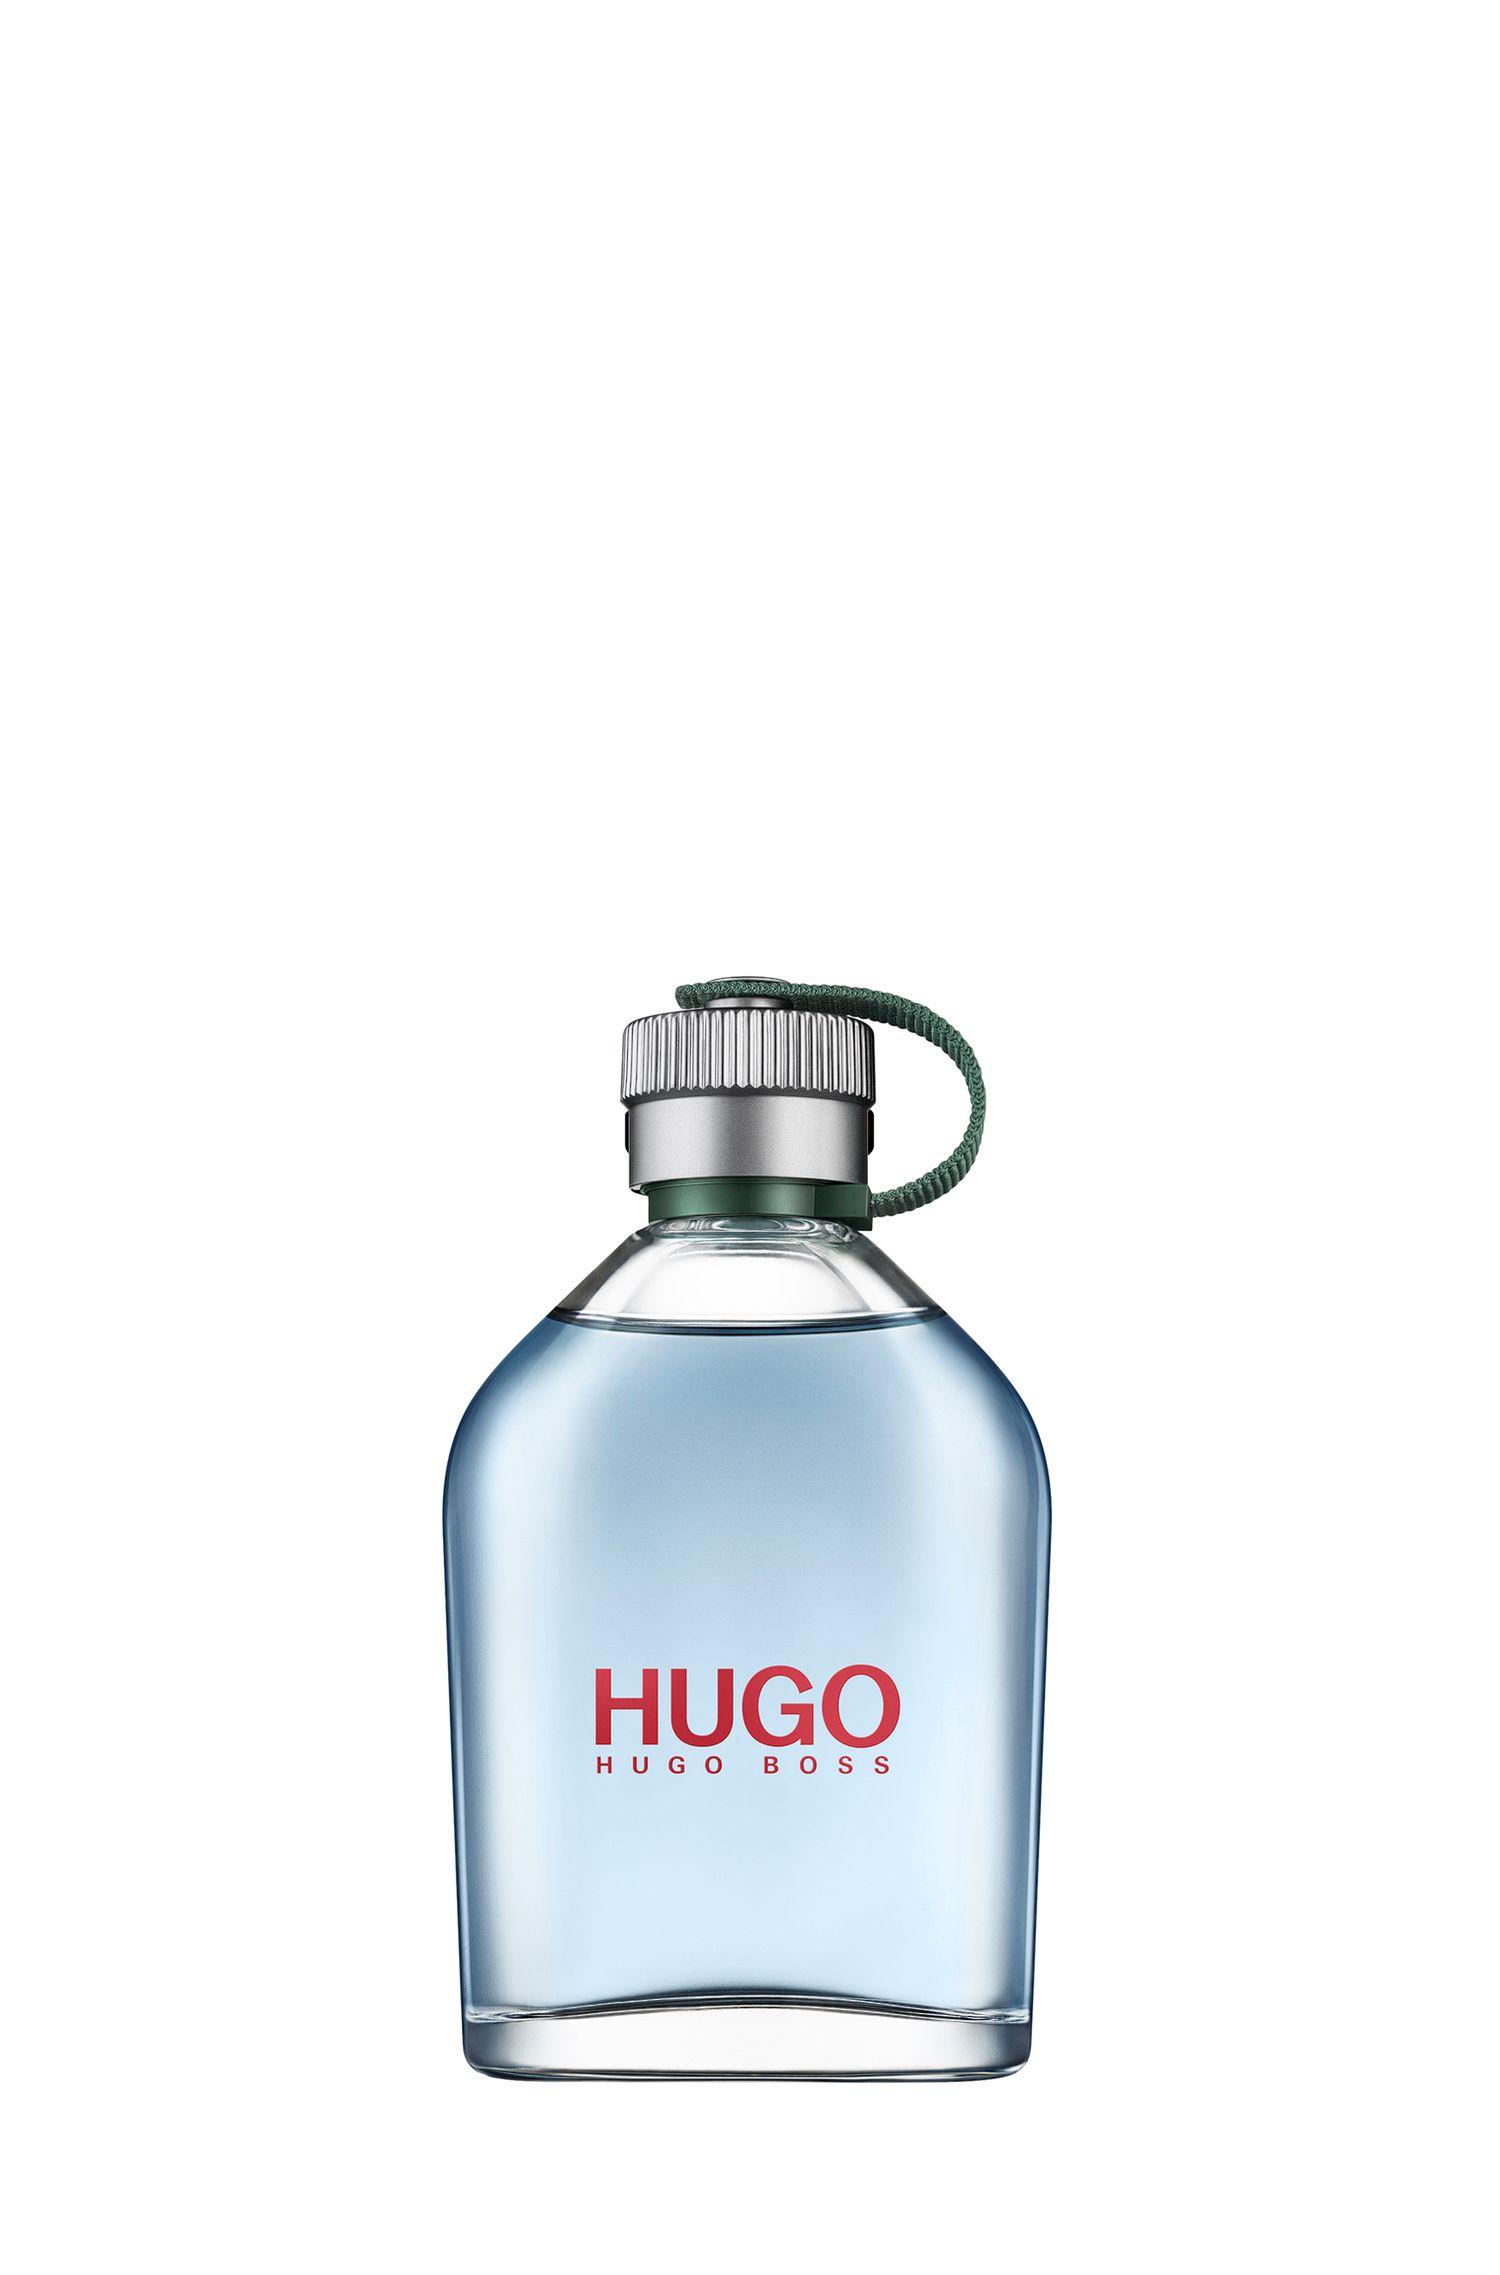 HUGO Man Eau de Toilette 200ml , Assorted-Pre-Pack